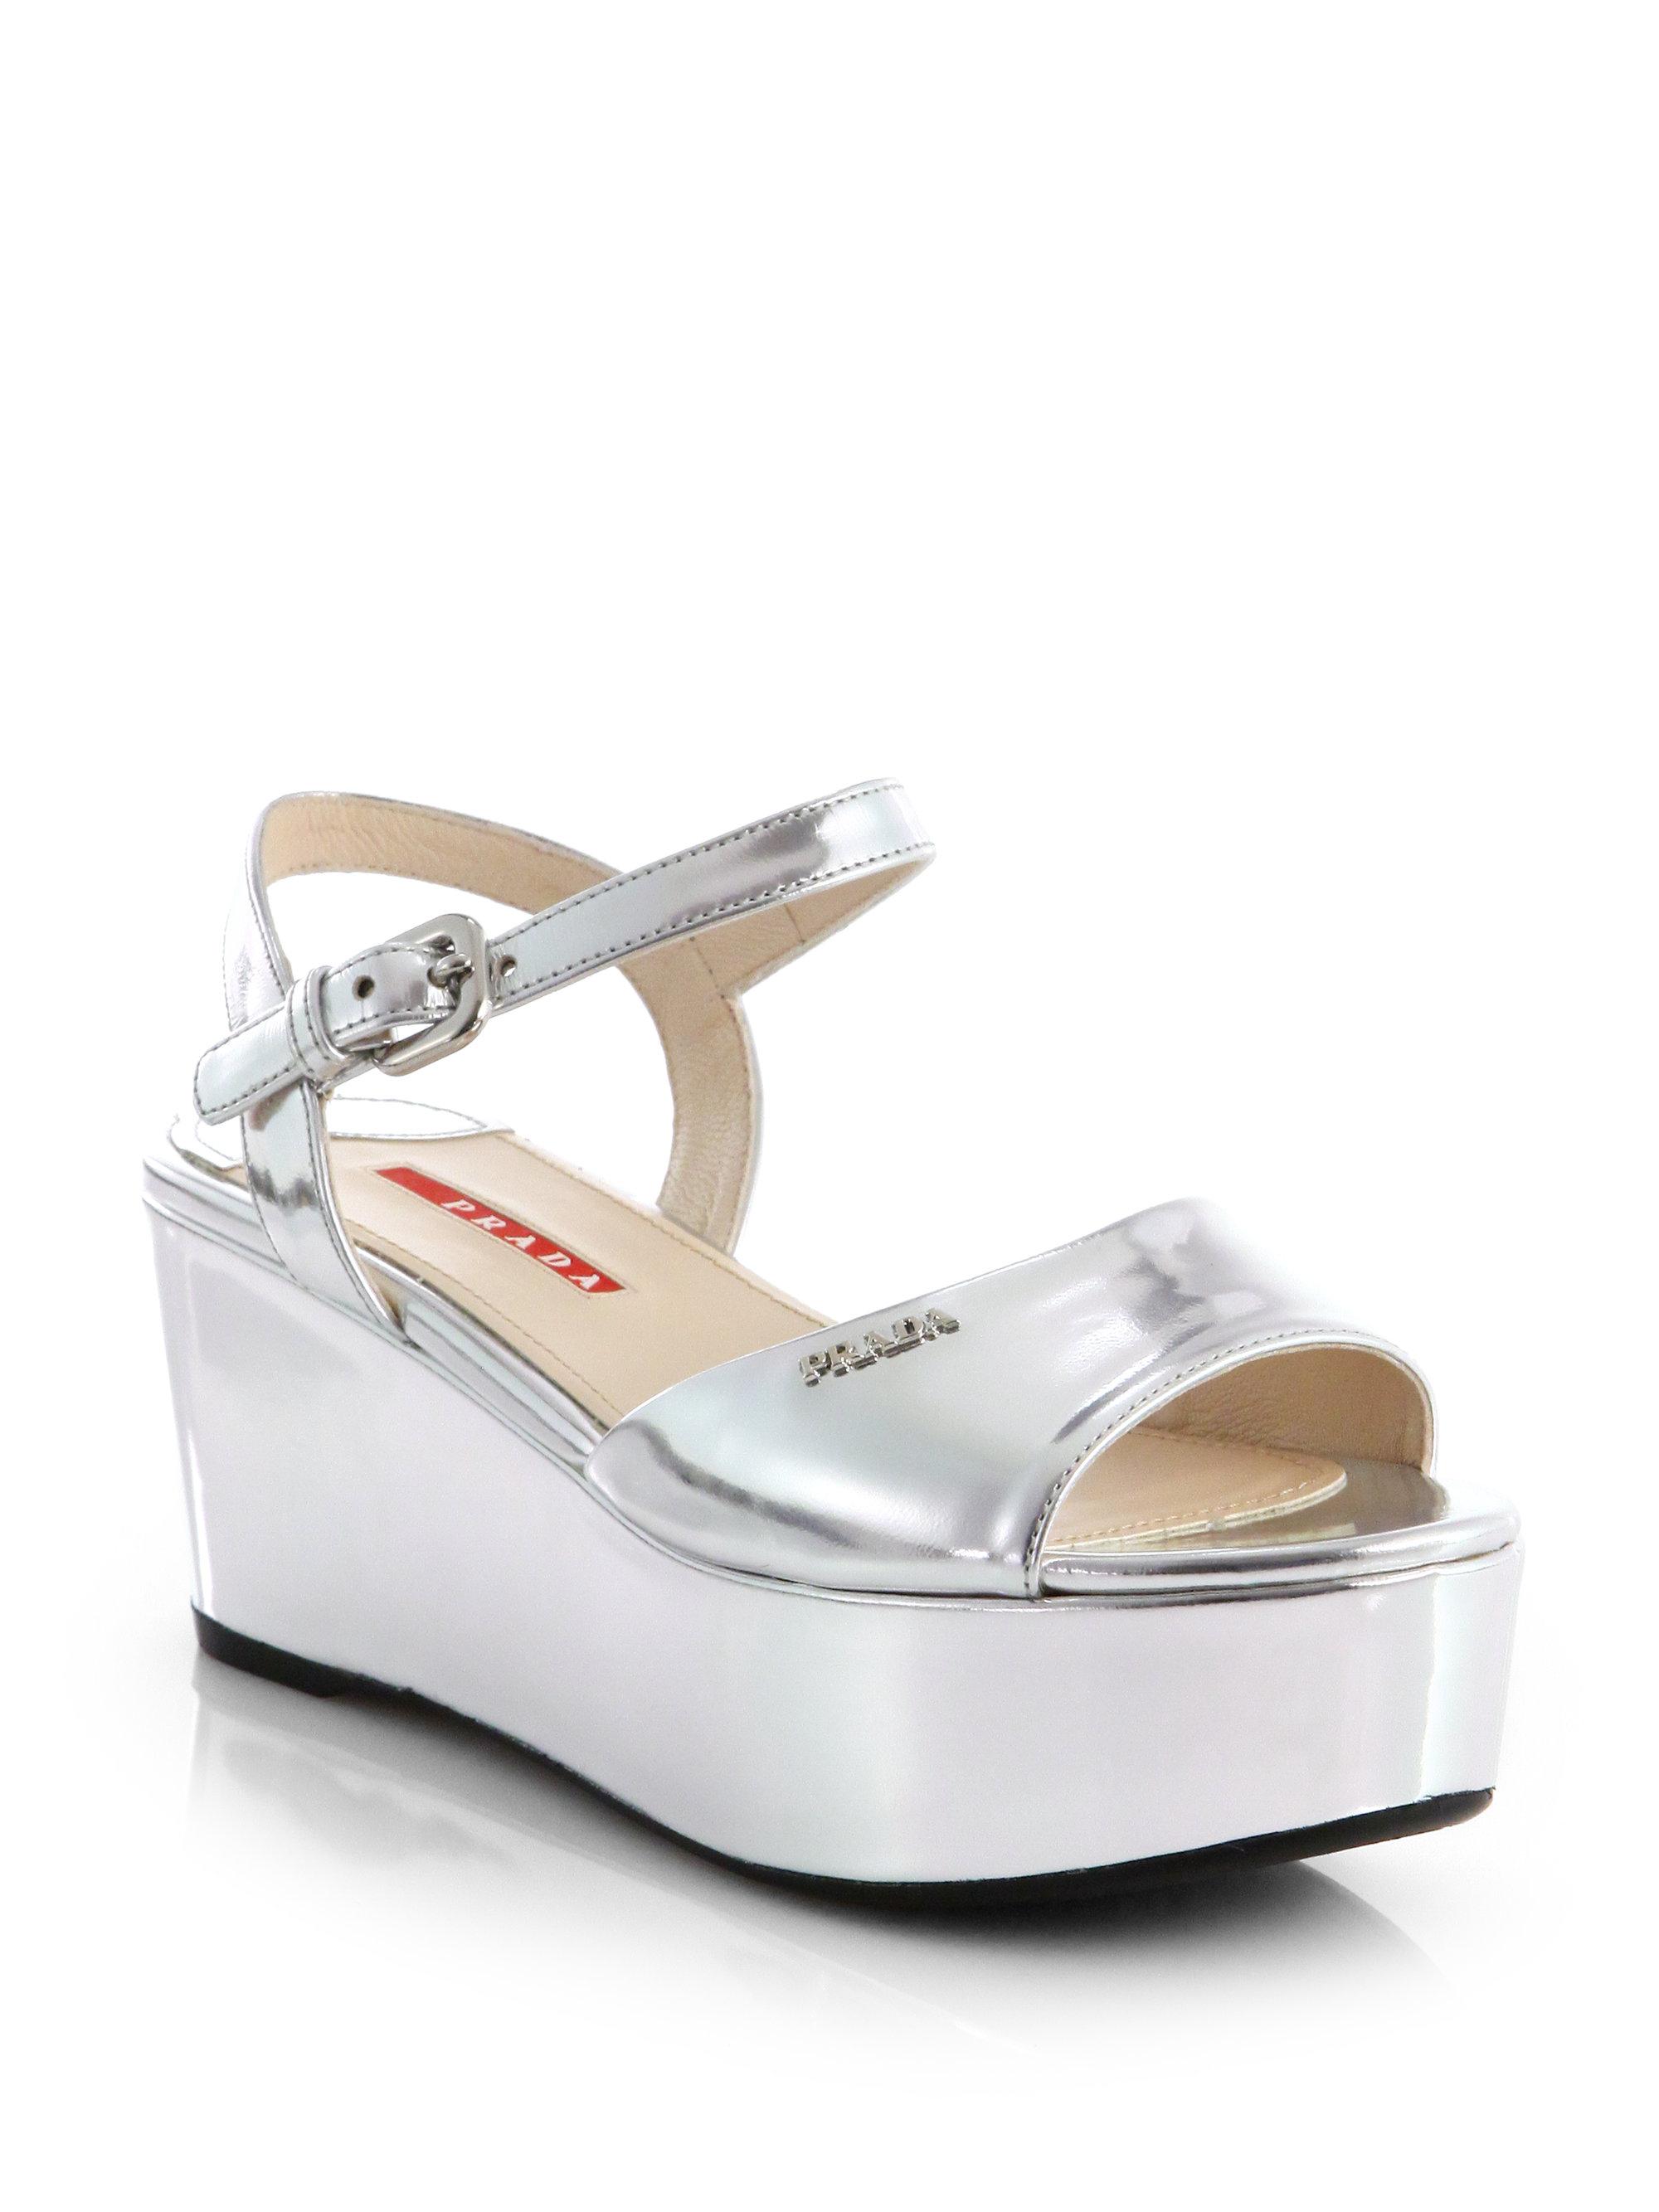 prada metallic leather platform wedge sandals in silver